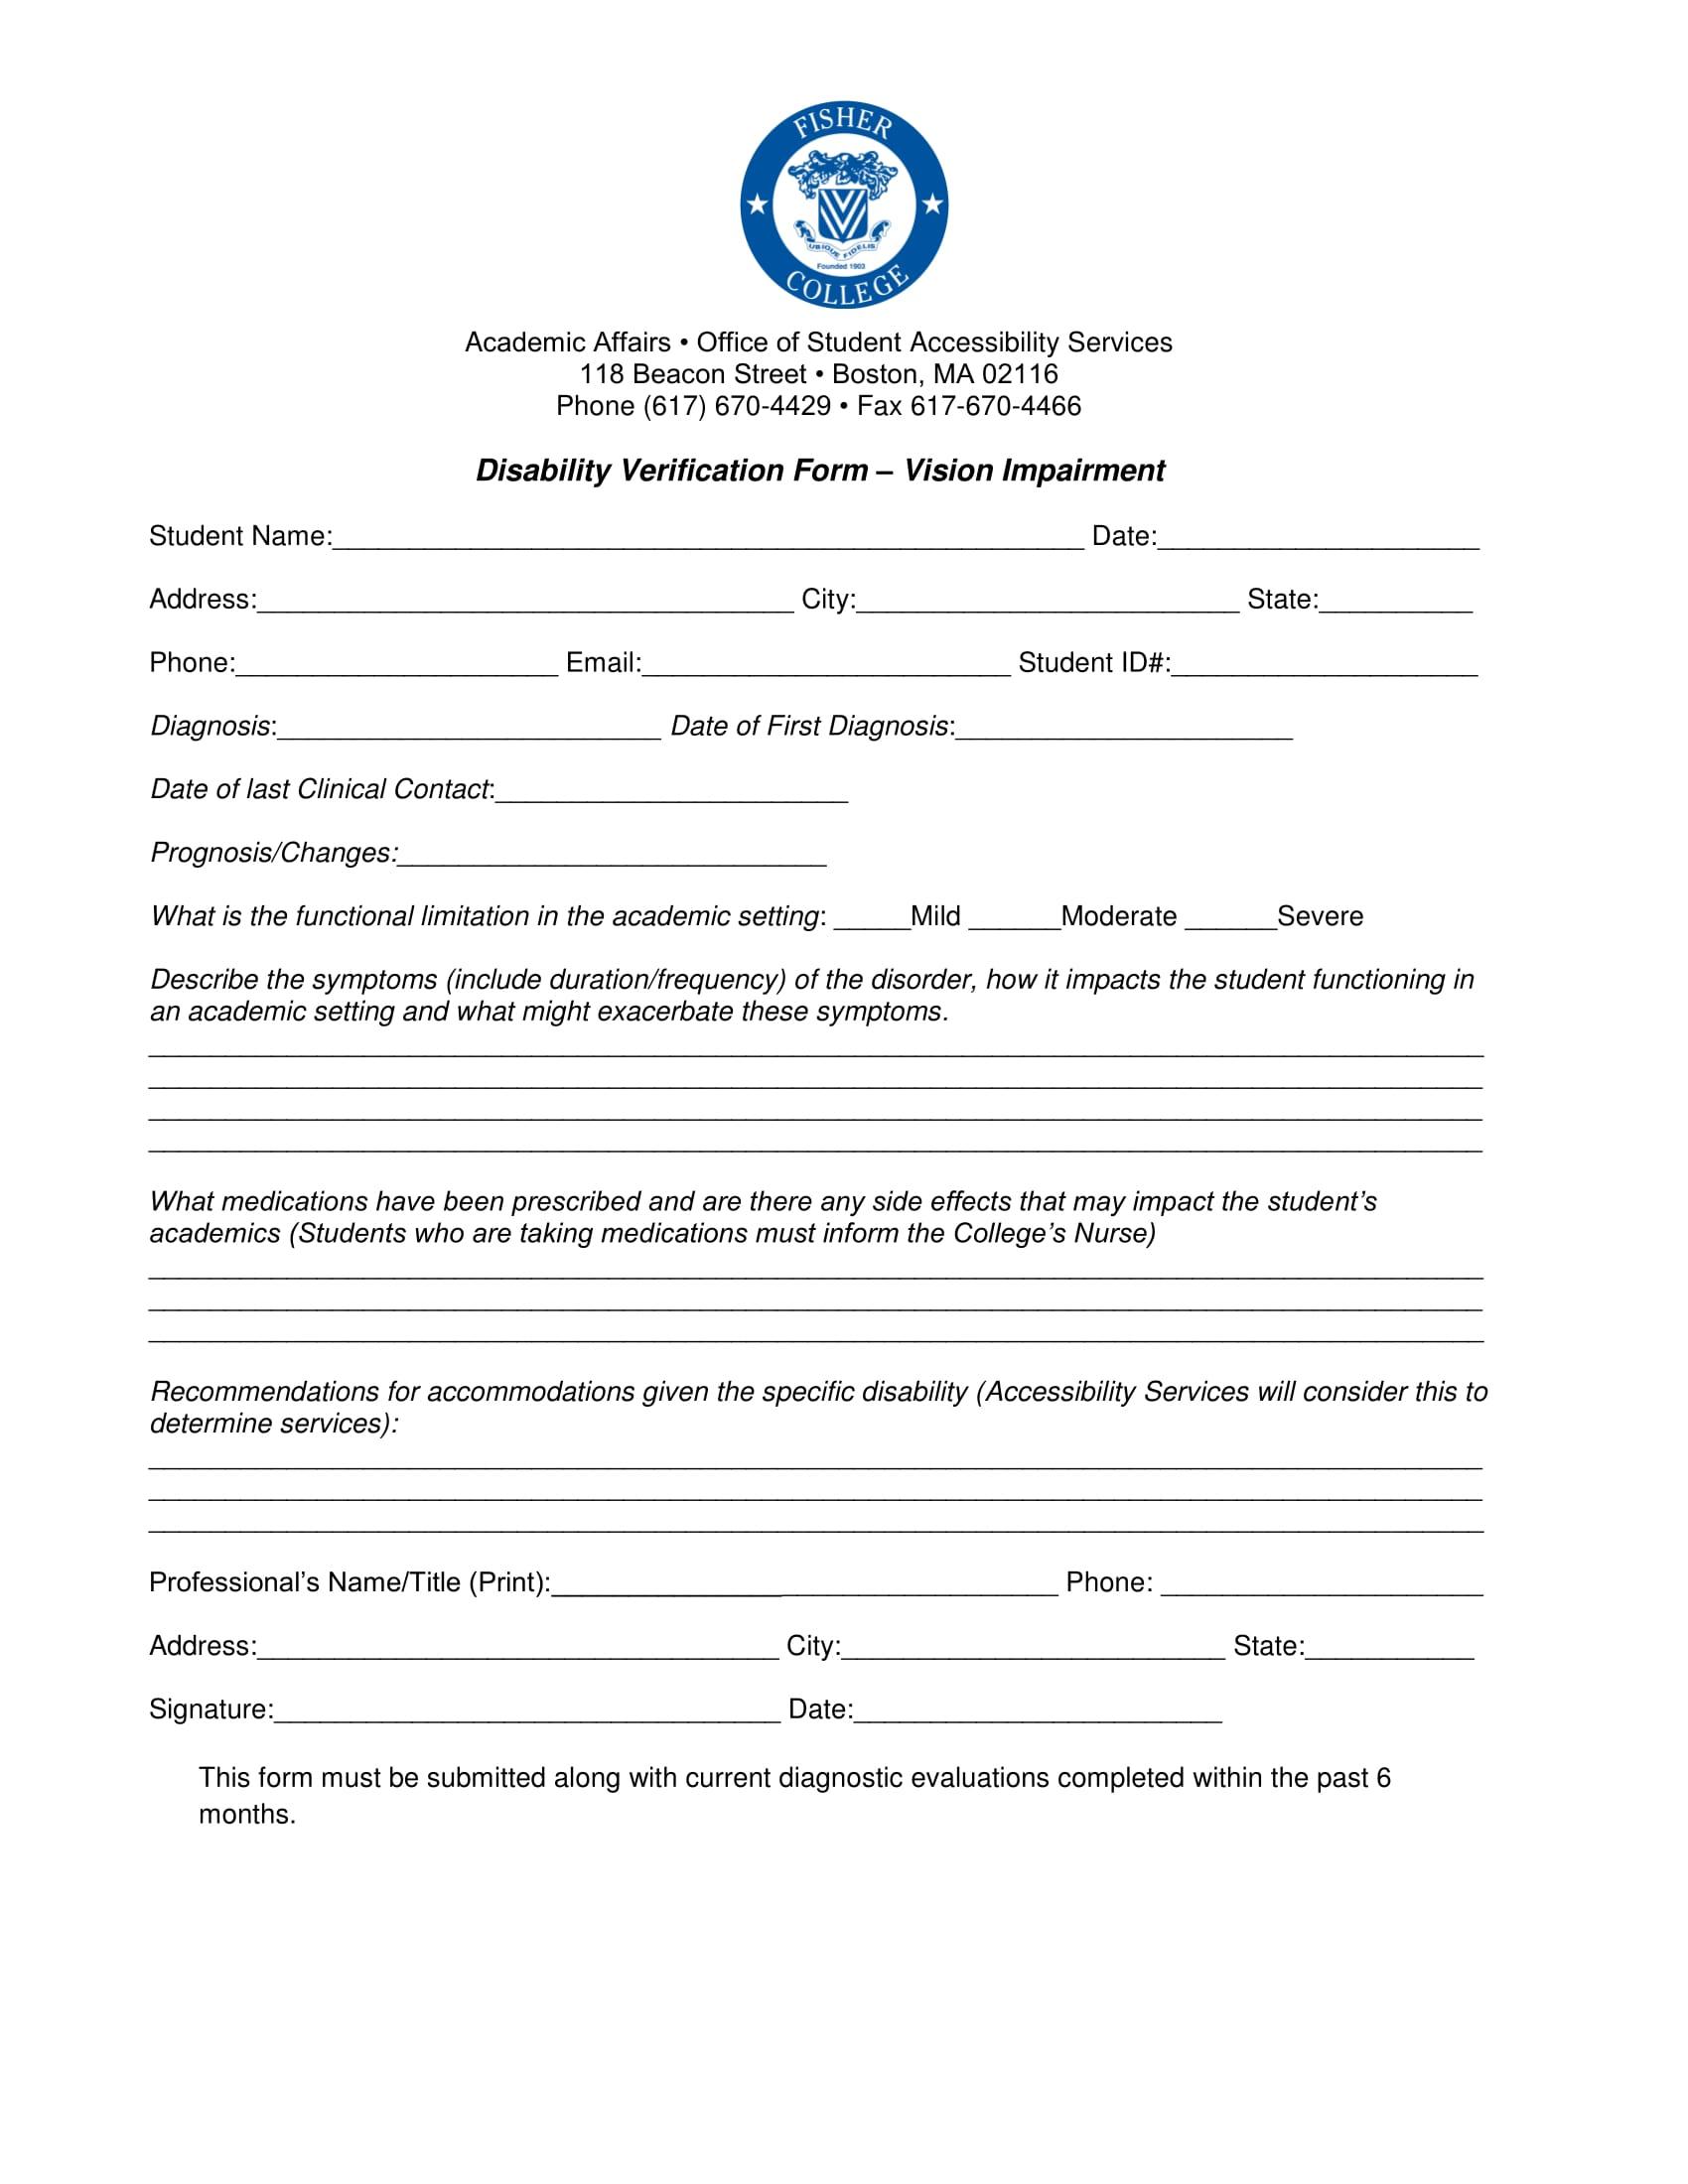 vision disability verification form 11